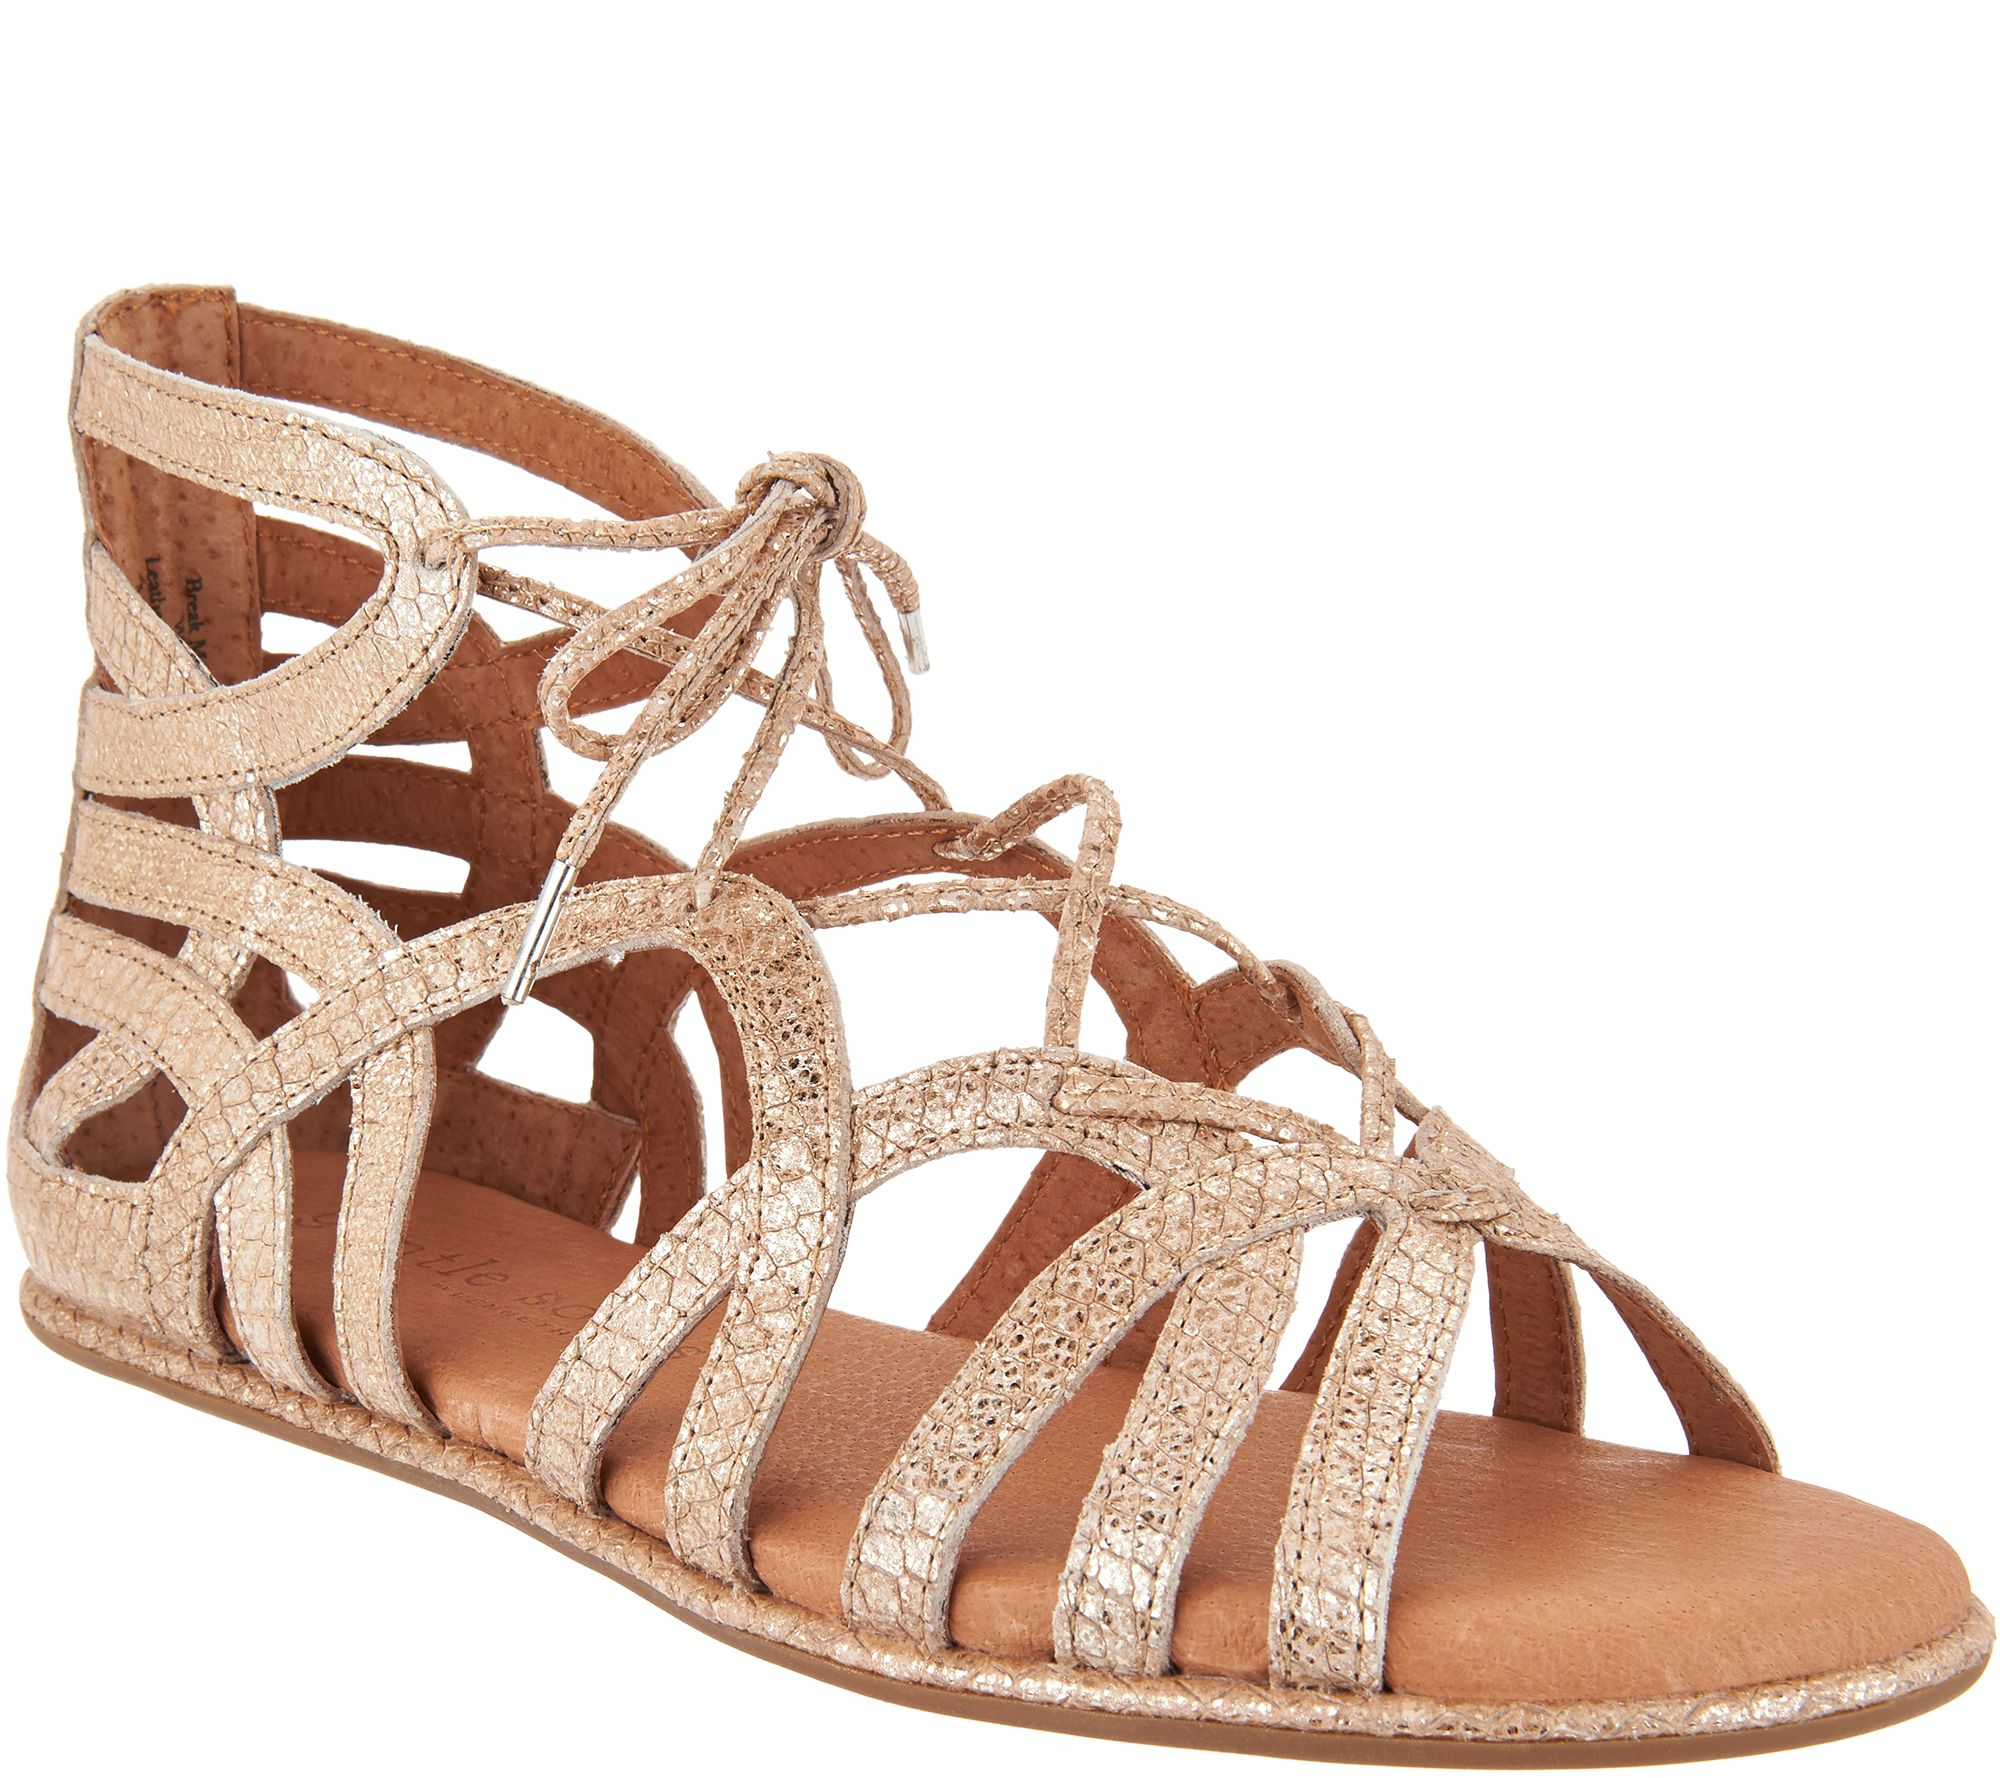 4c43c23ad3 Gentle Souls Leather Lace-up Sandals - Break My Heart - Page 1 — QVC.com